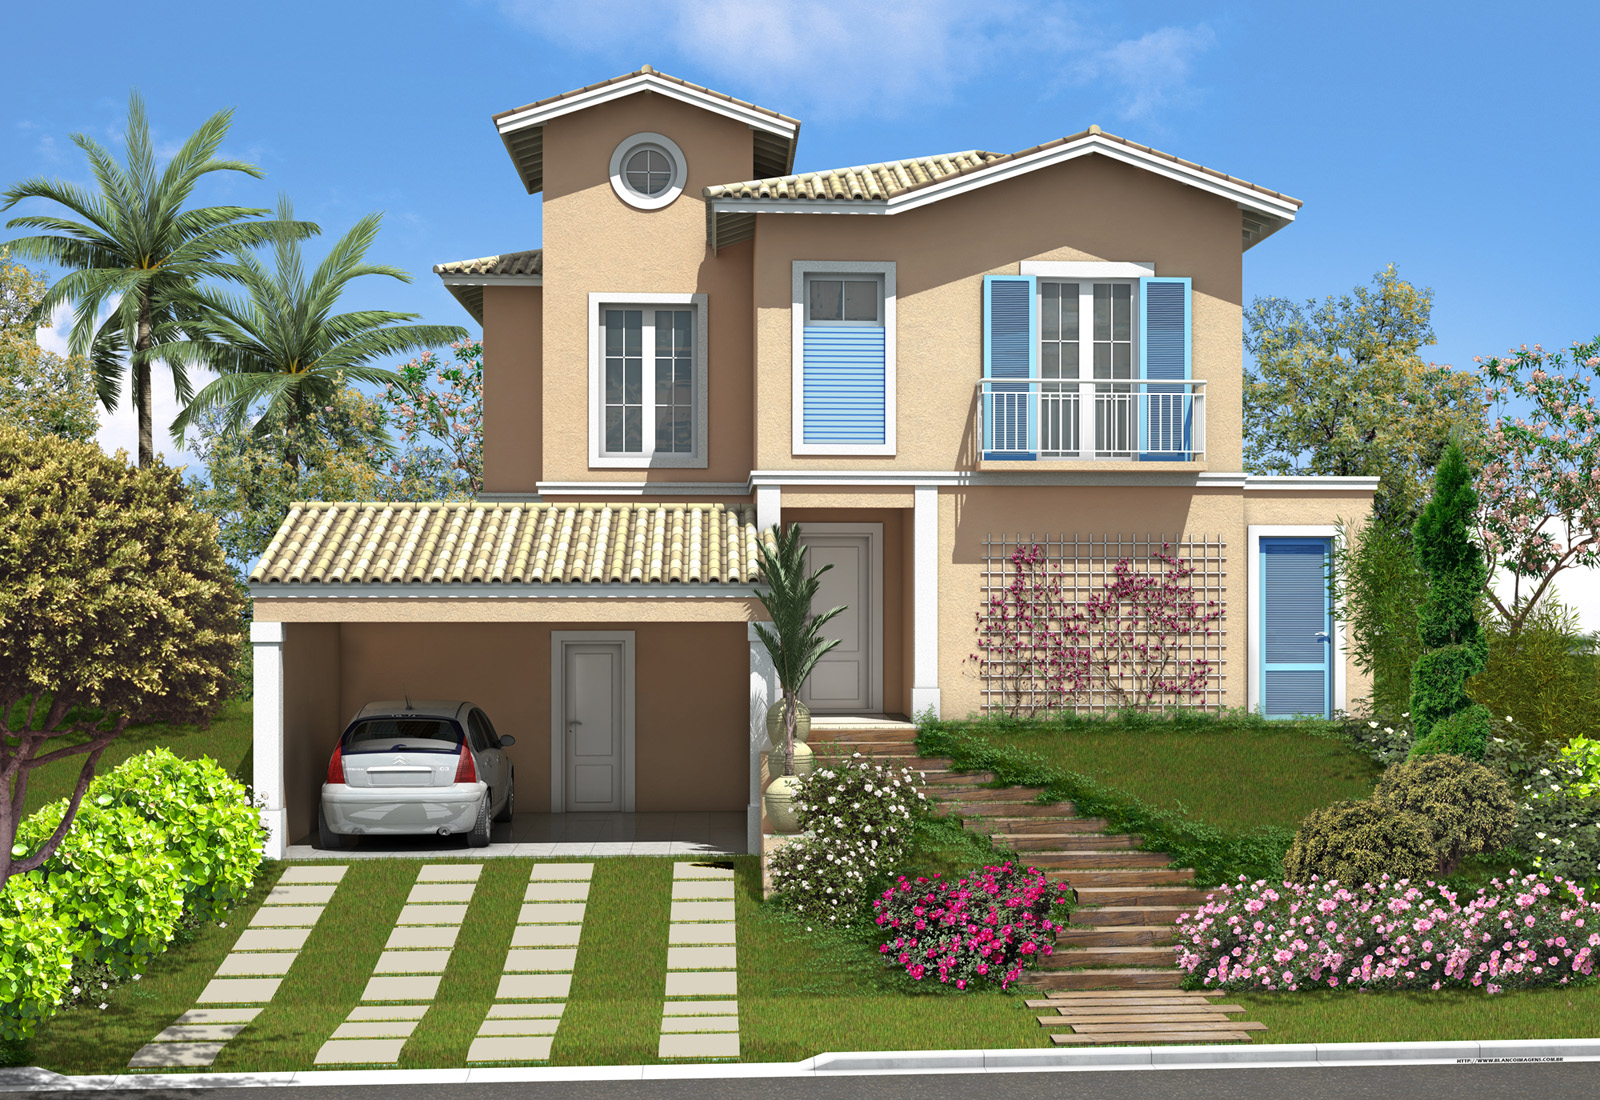 A fachada da sua casa emile m veis for Modelo de fachadas para casas modernas